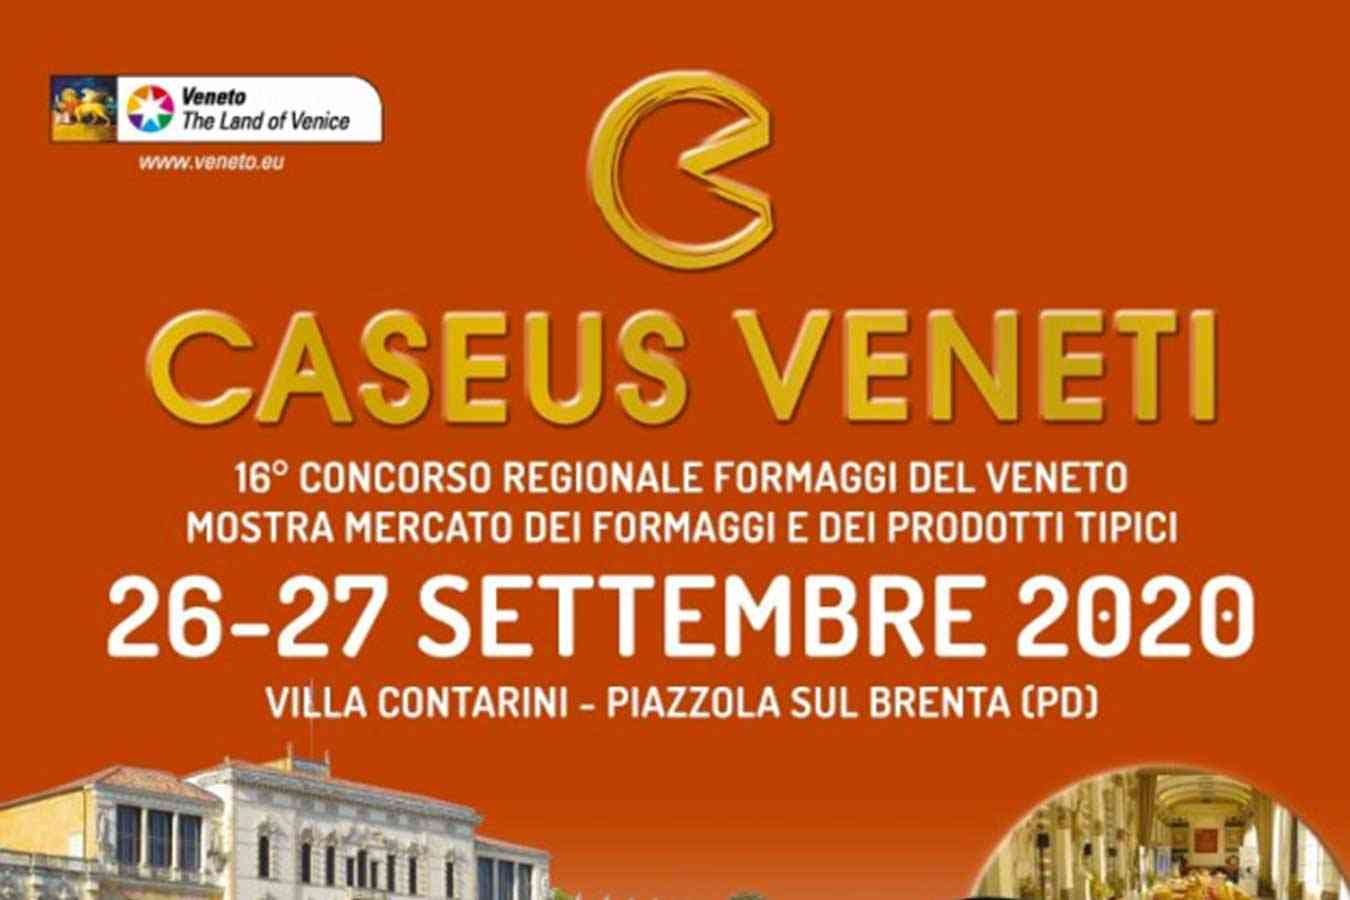 CASEUS VENETI 2020: Monte Veronese DOP nel cuore della Toscana